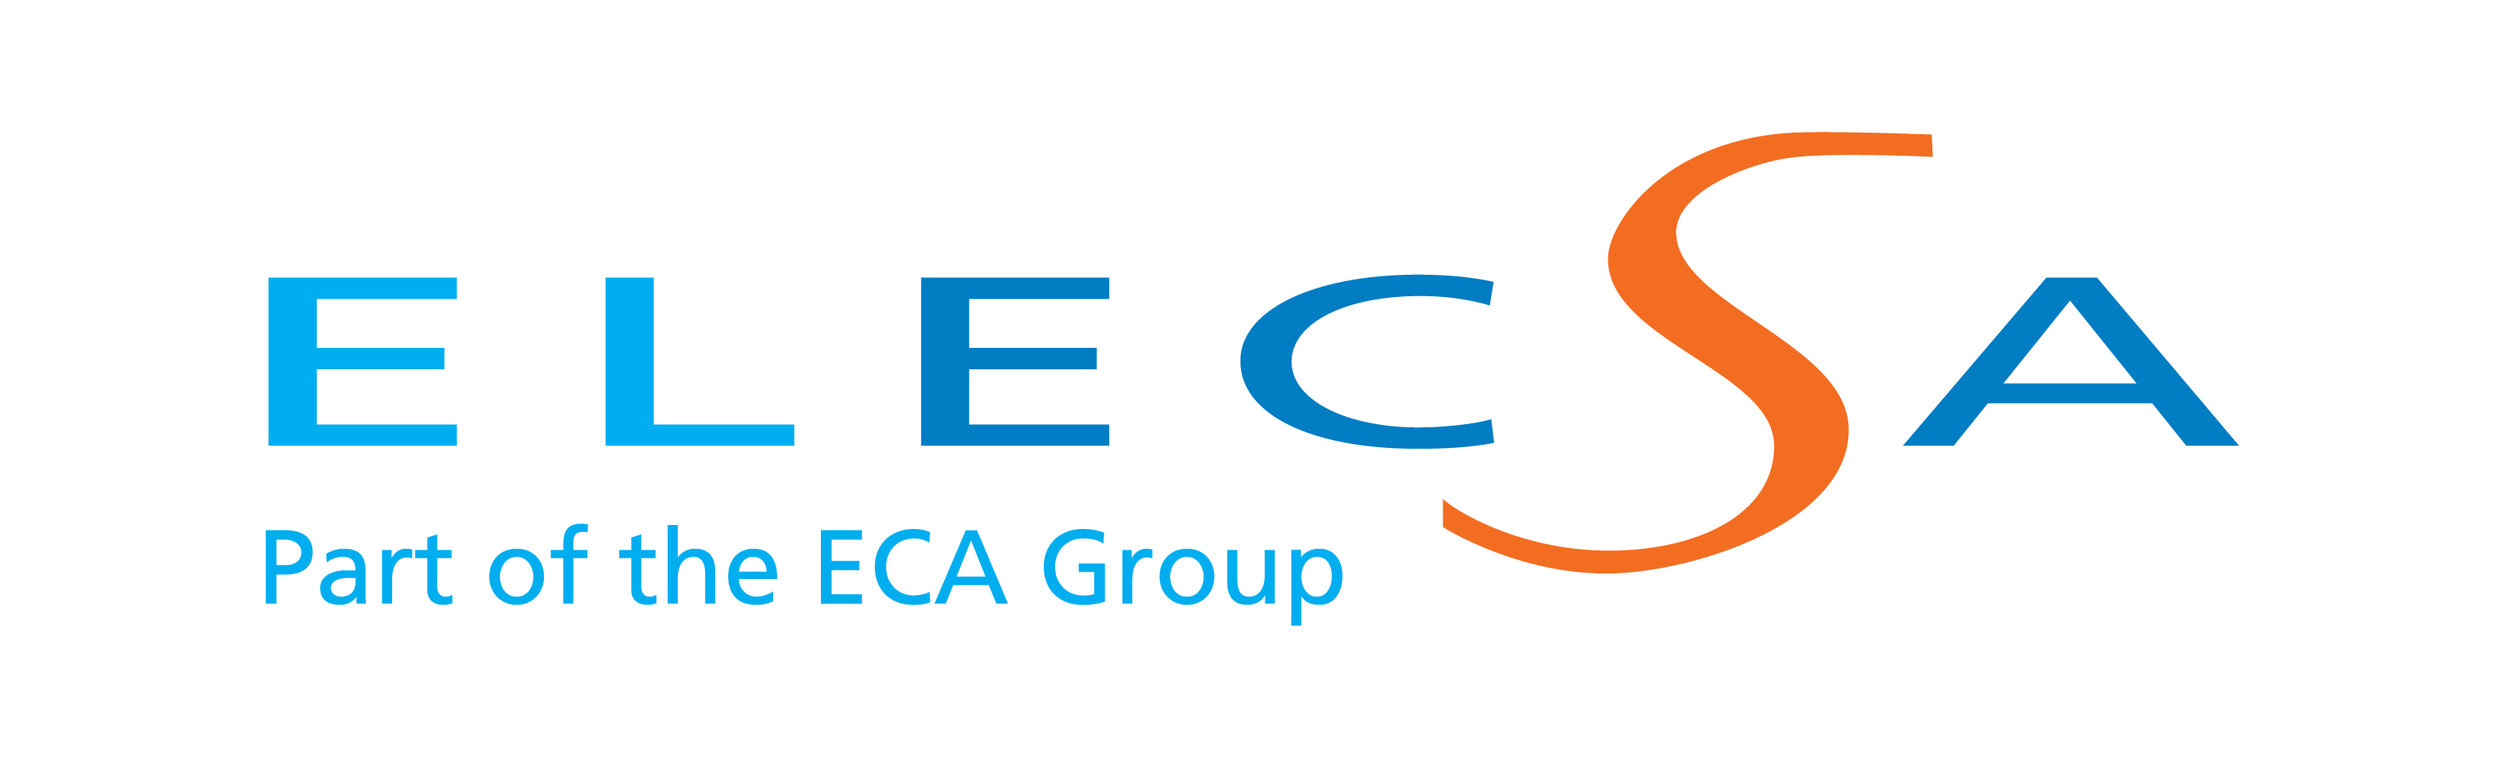 new-elecsa-logo.jpg